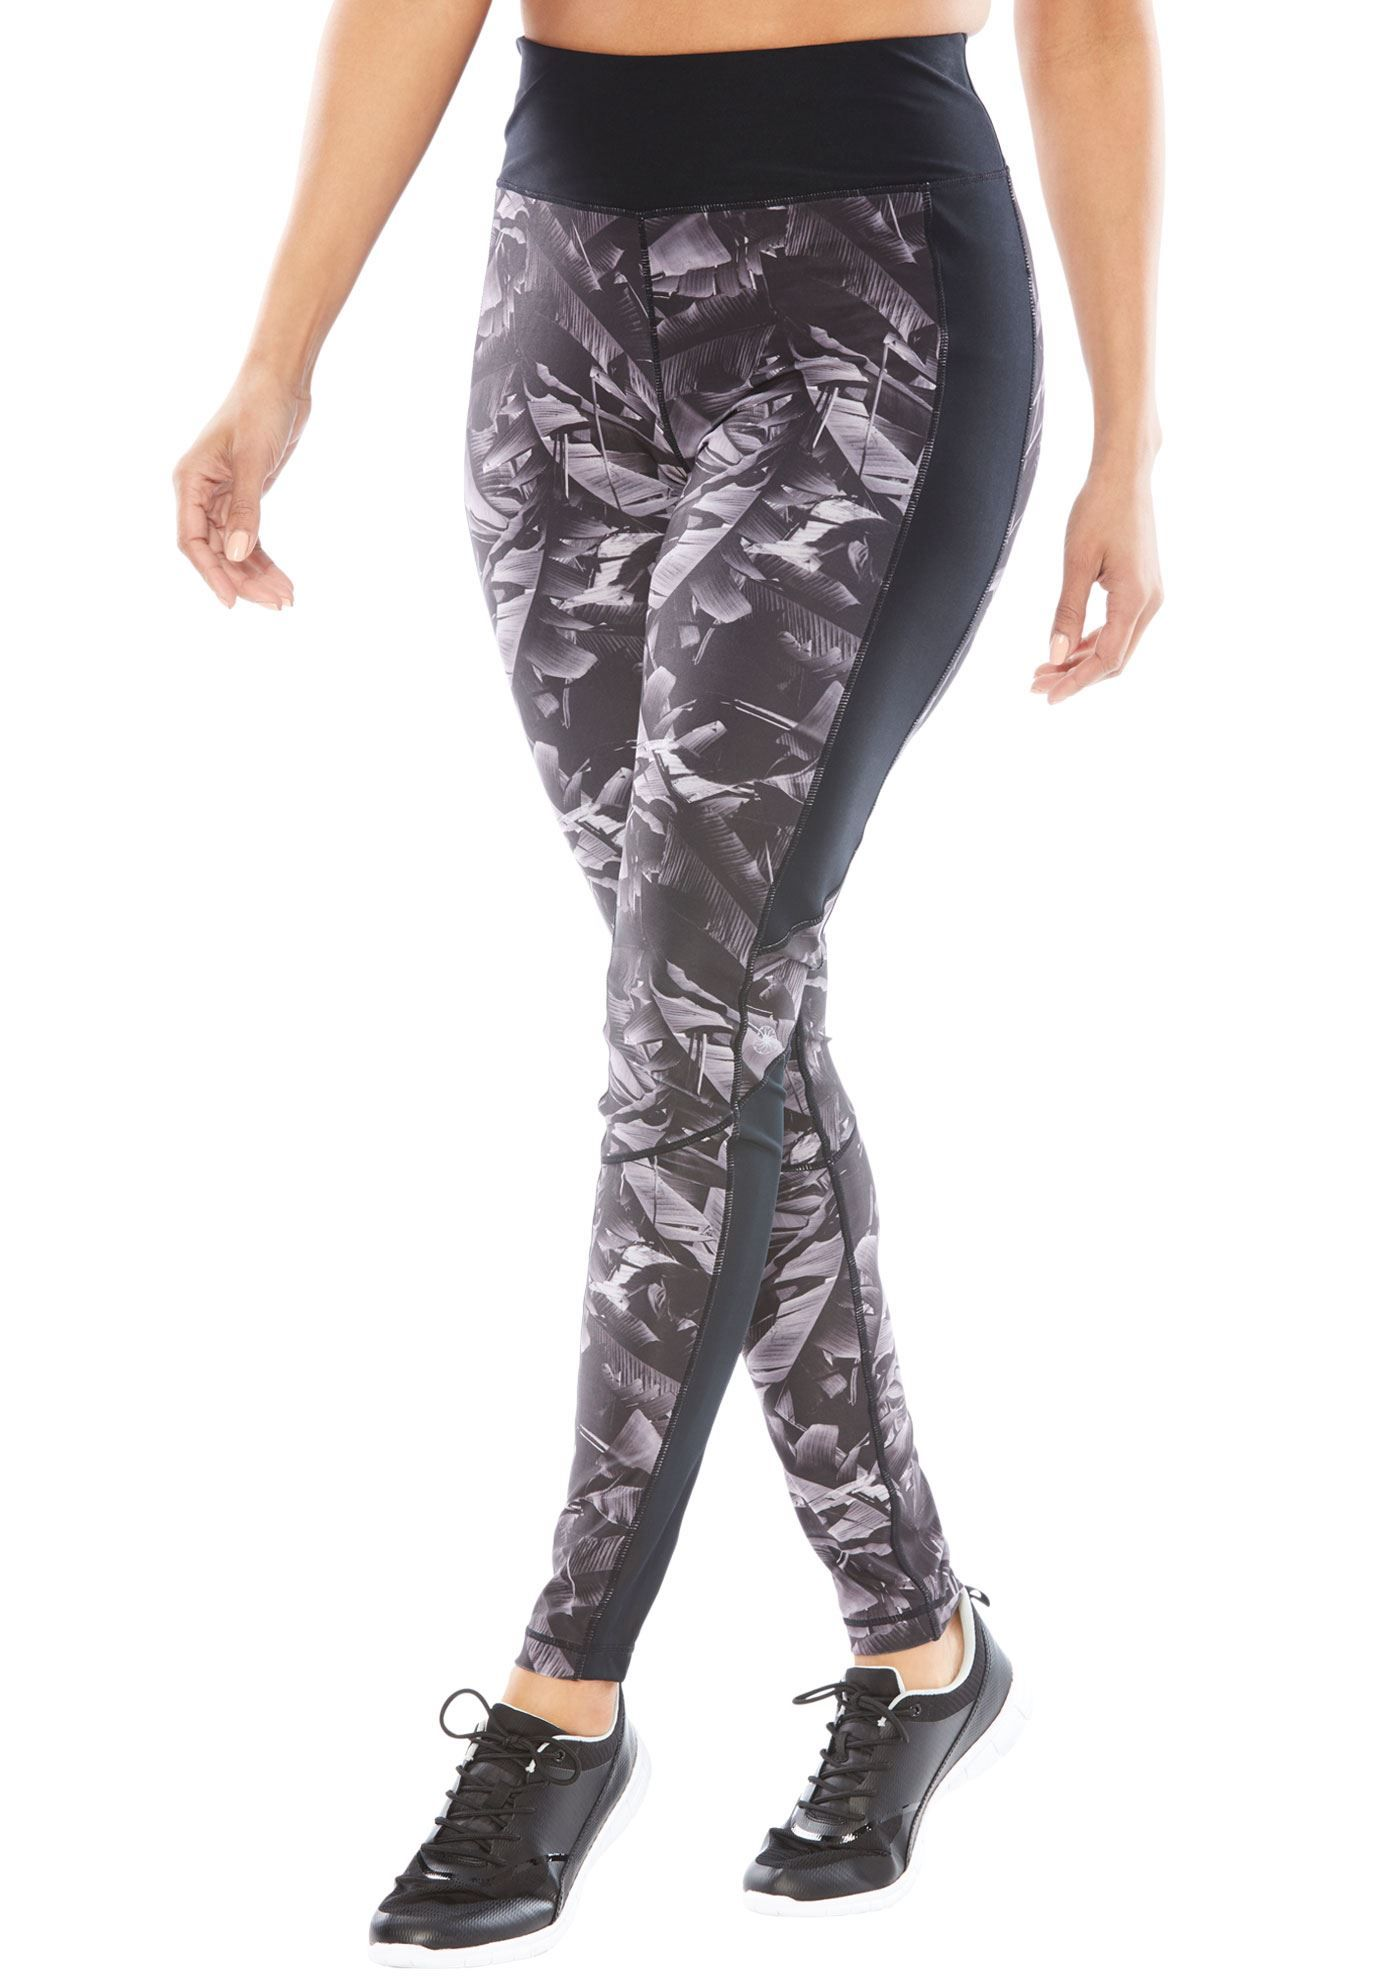 3f848dd9731dd Tummy Control Leggings by fullbeauty SPORT reg  - Women s Plus Size Clothing